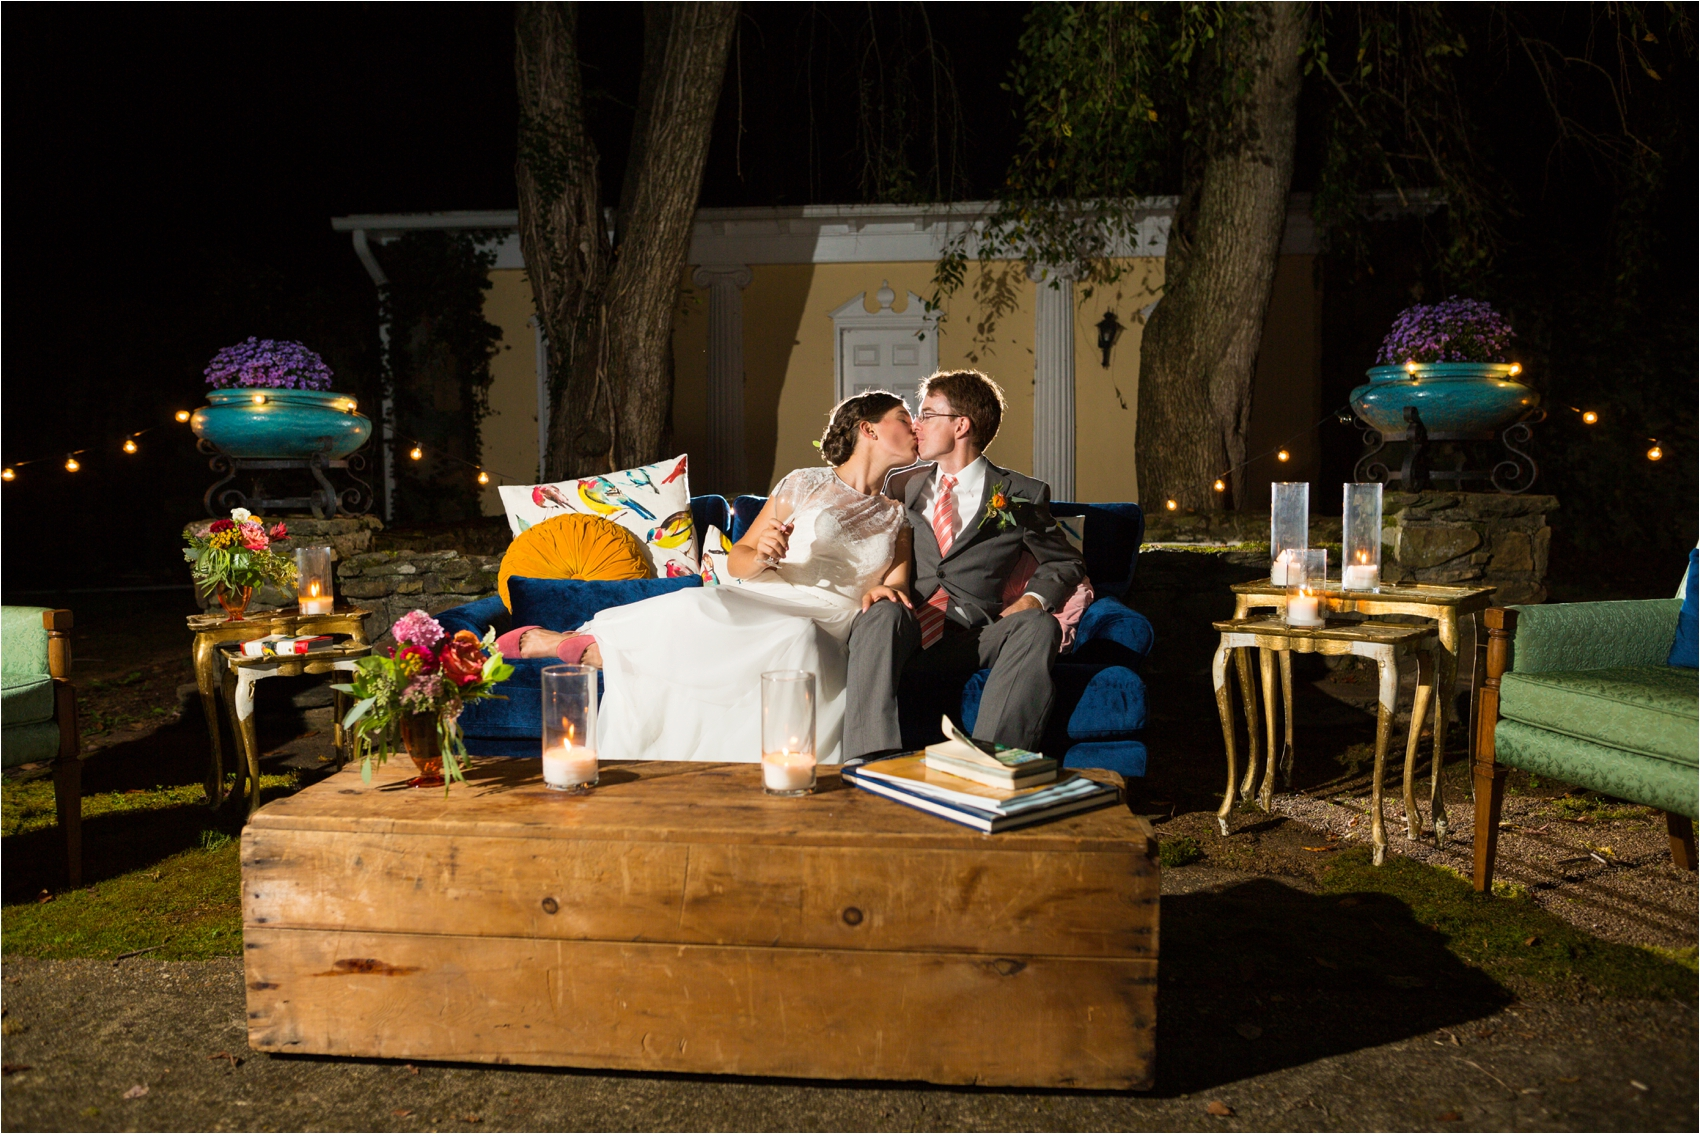 Feather-and-Oak-Rainforest-Trust-Virginia-Wedding-2-24.jpg